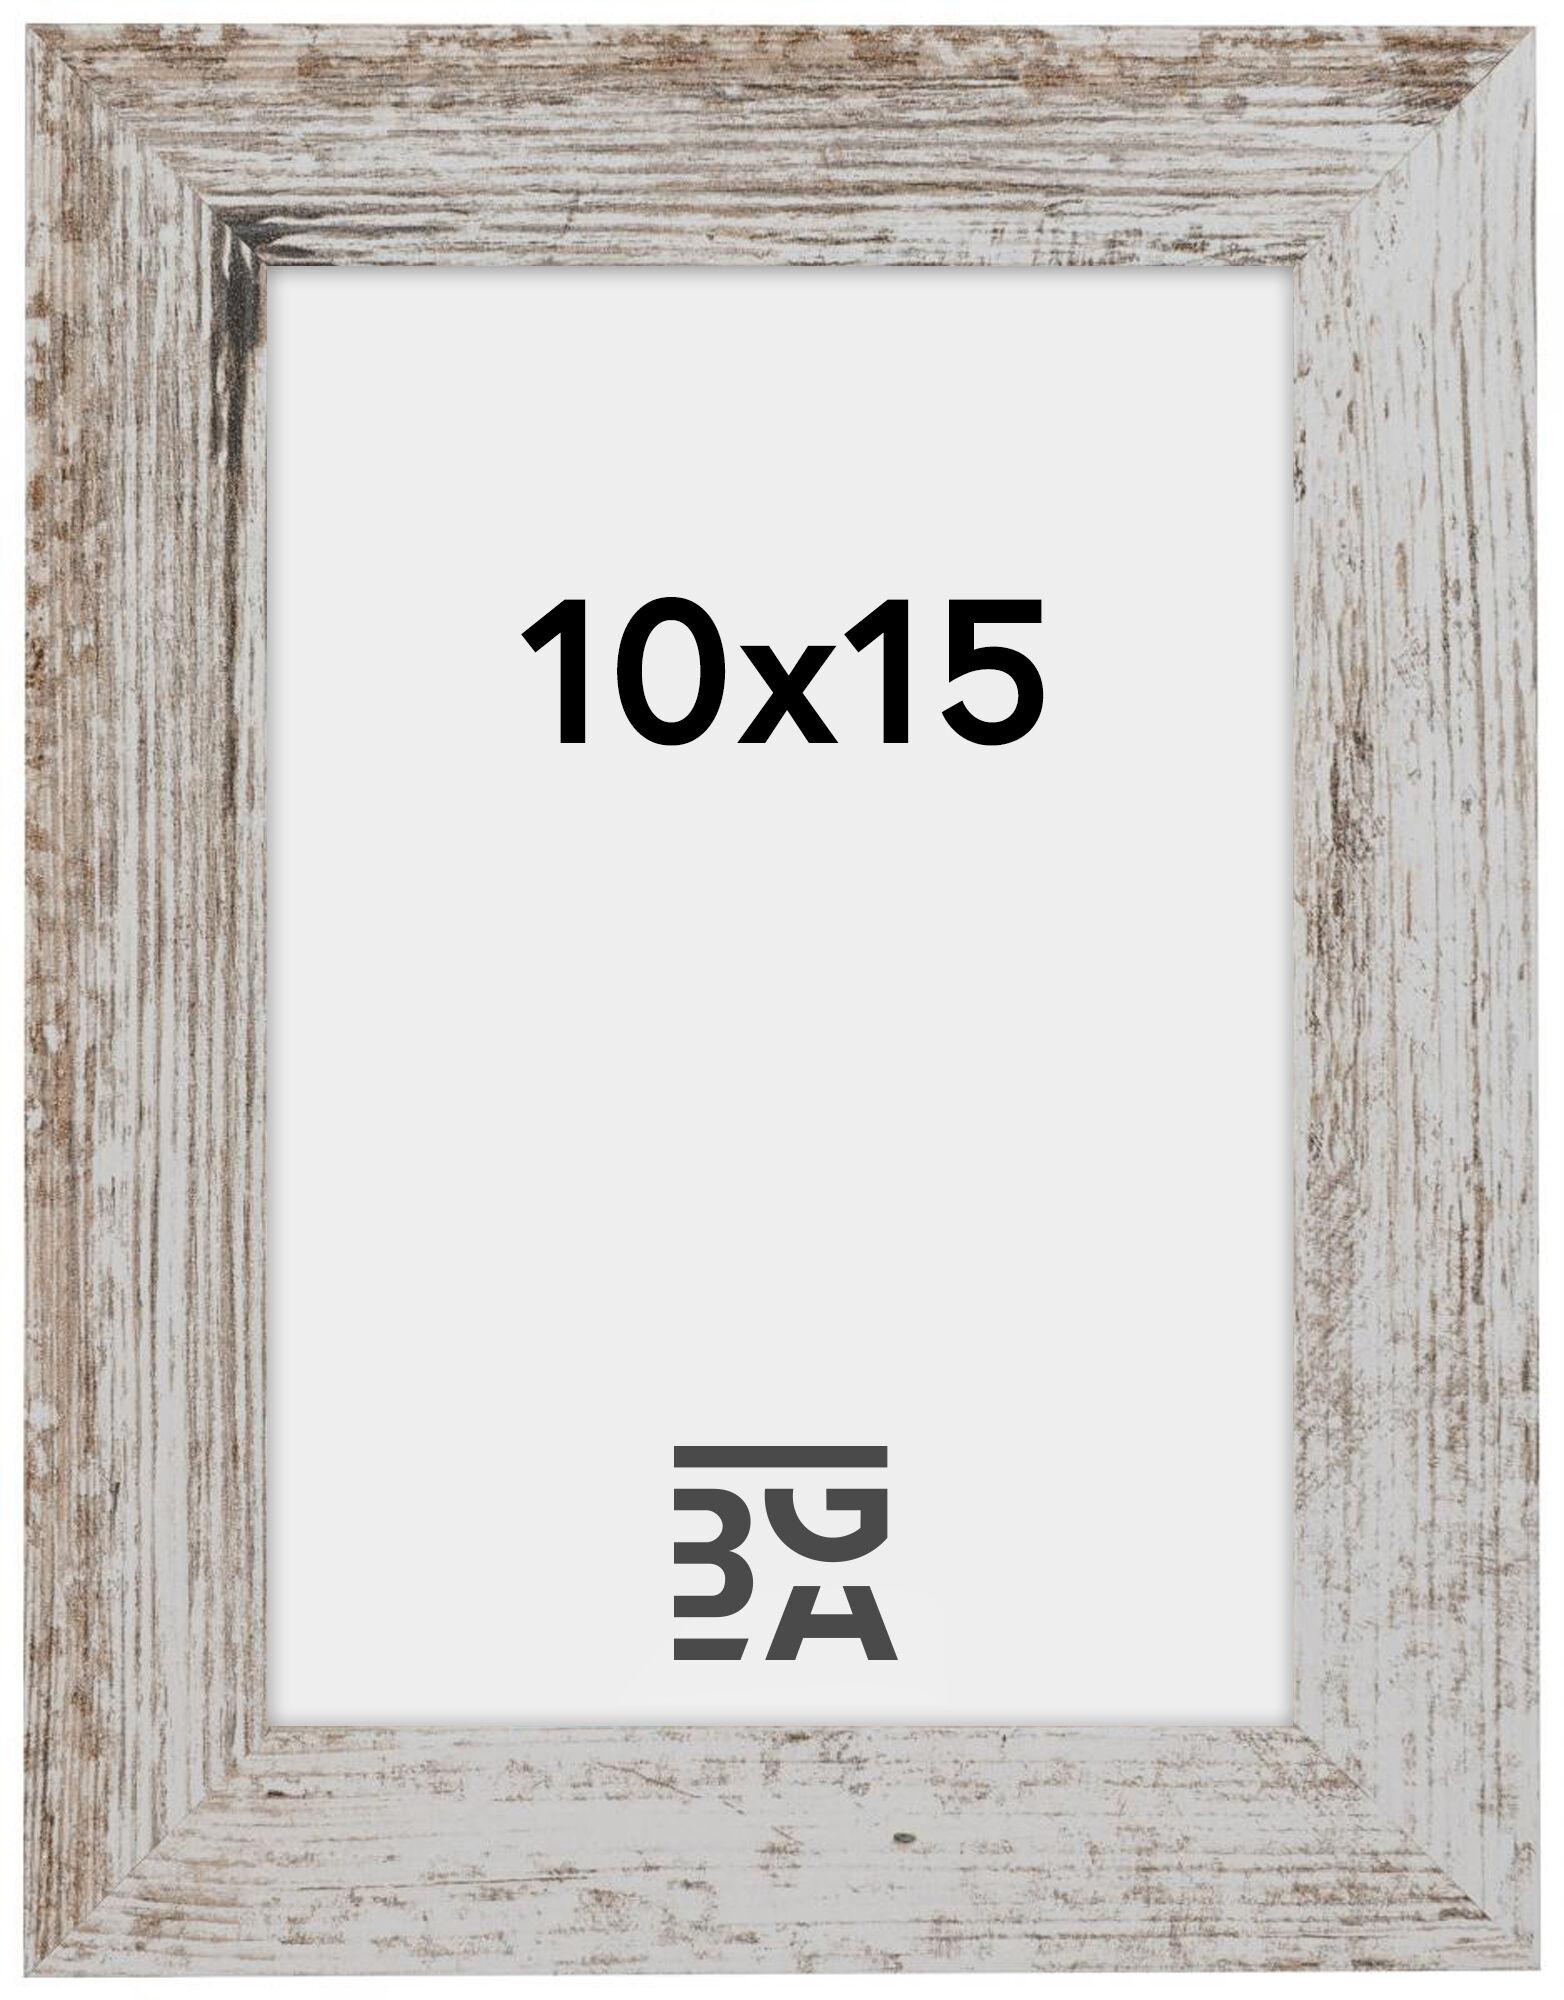 Estancia Superb AA 10x15 cm